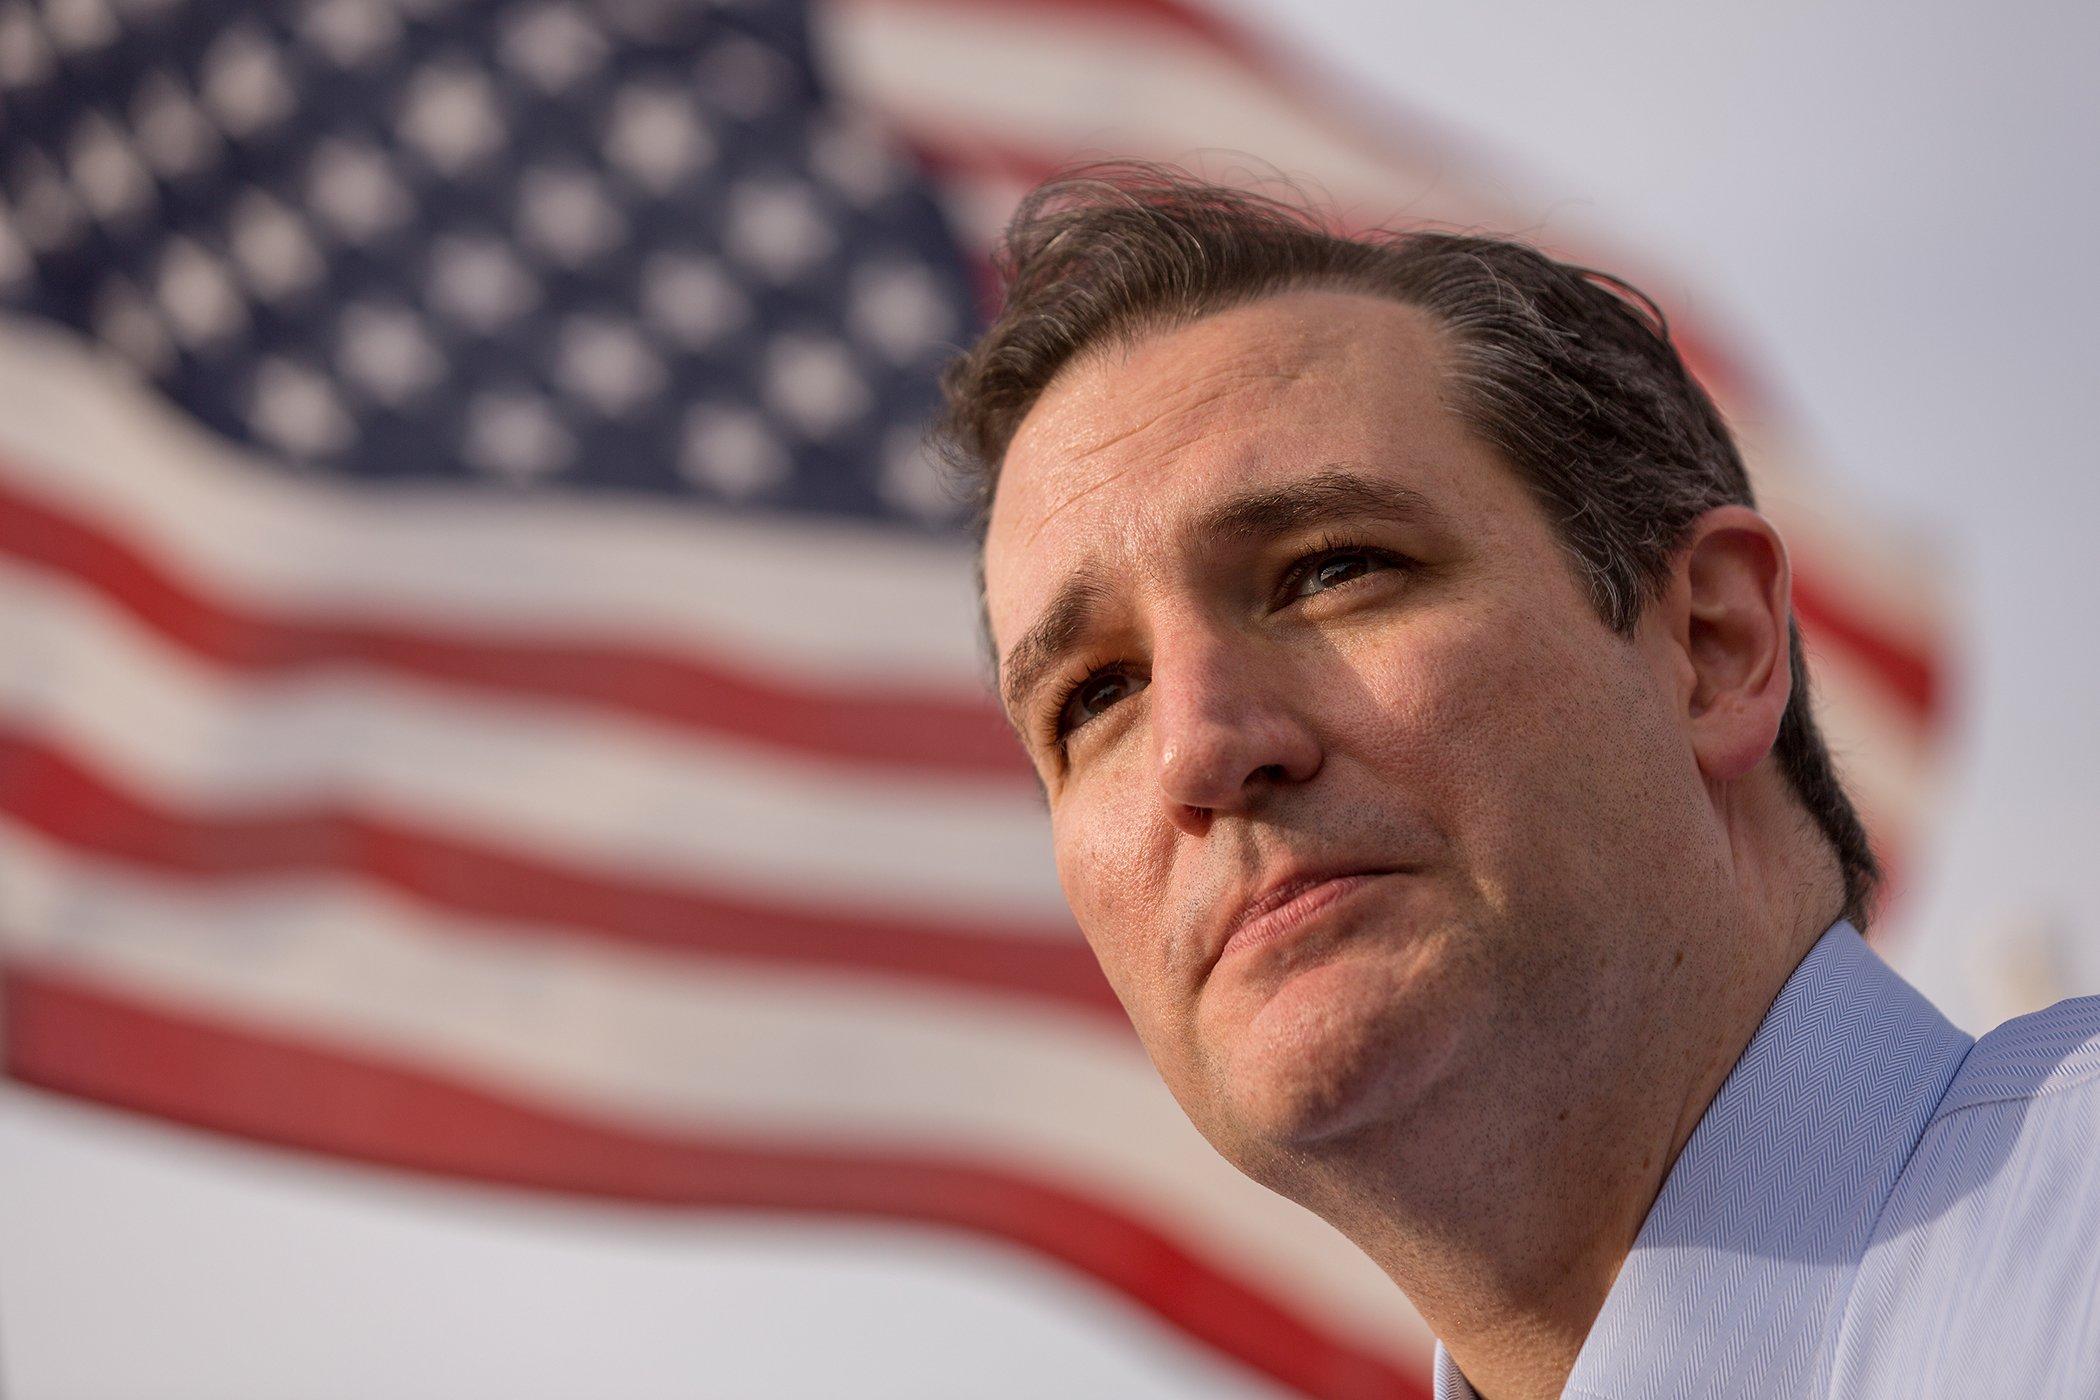 GOP Presidential Hopeful Ted Cruz Campaigns In South Carolina